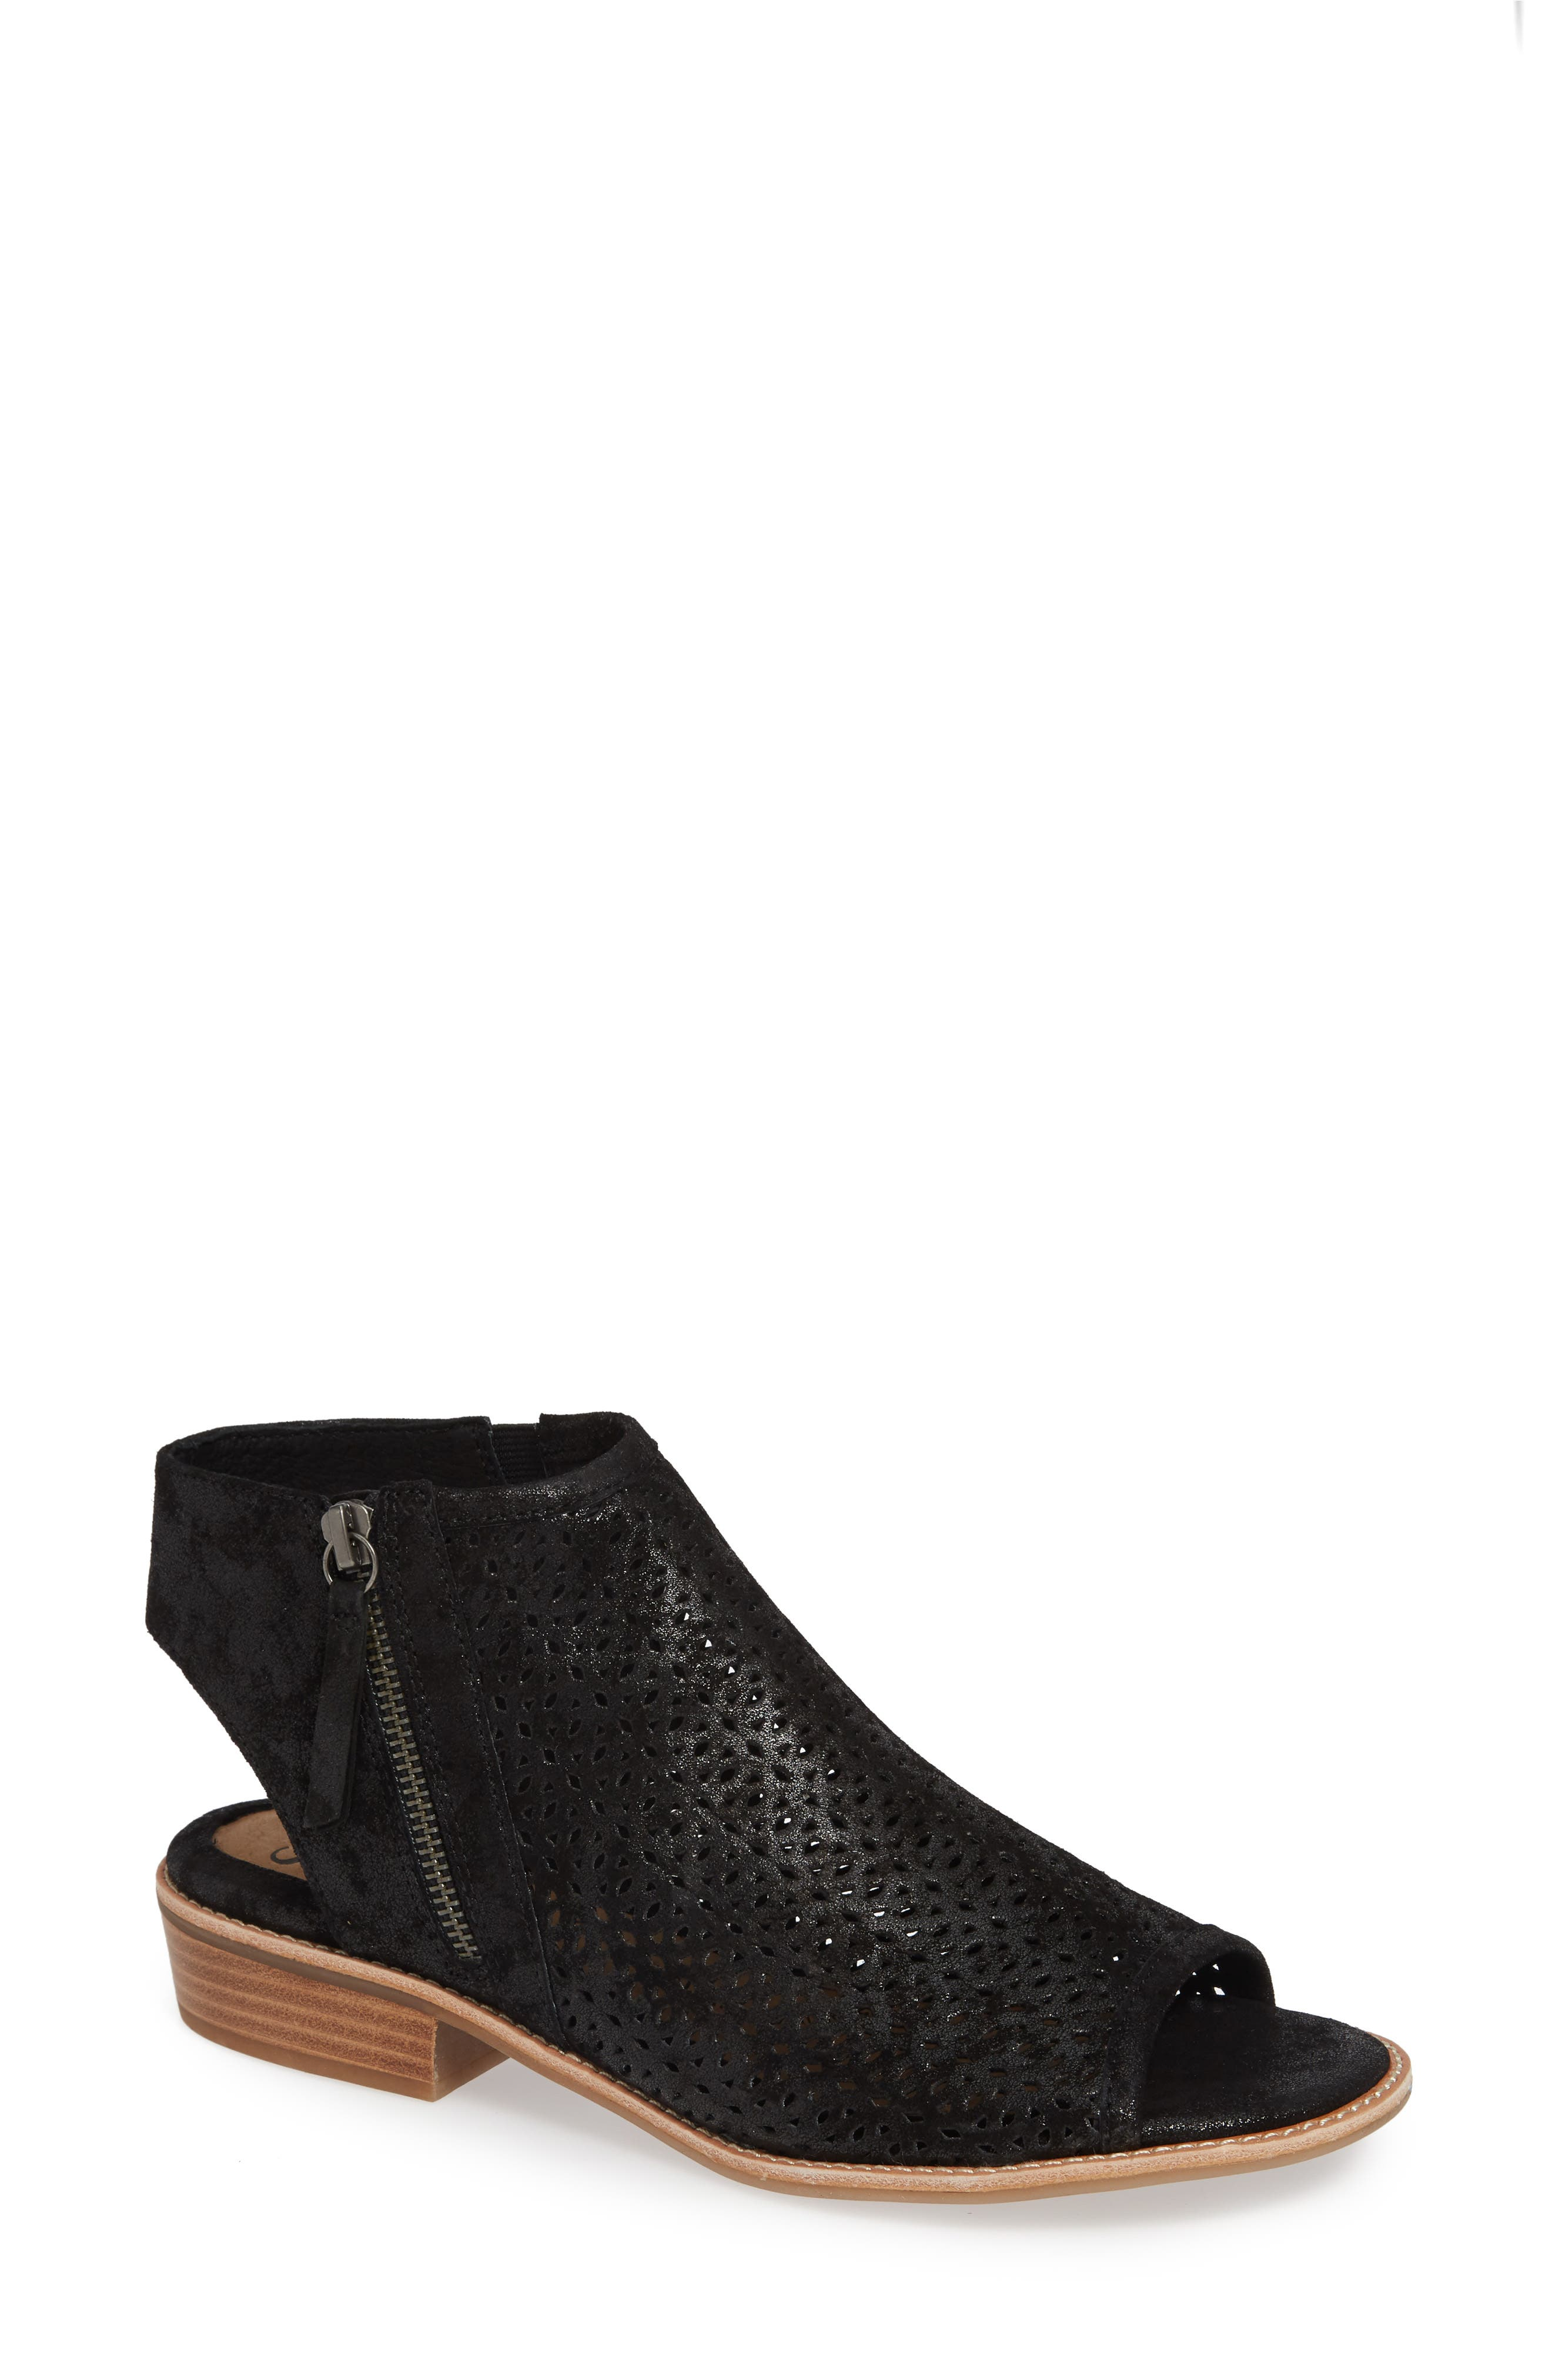 Natesa Perforated Sandal,                             Main thumbnail 1, color,                             BLACK SUEDE